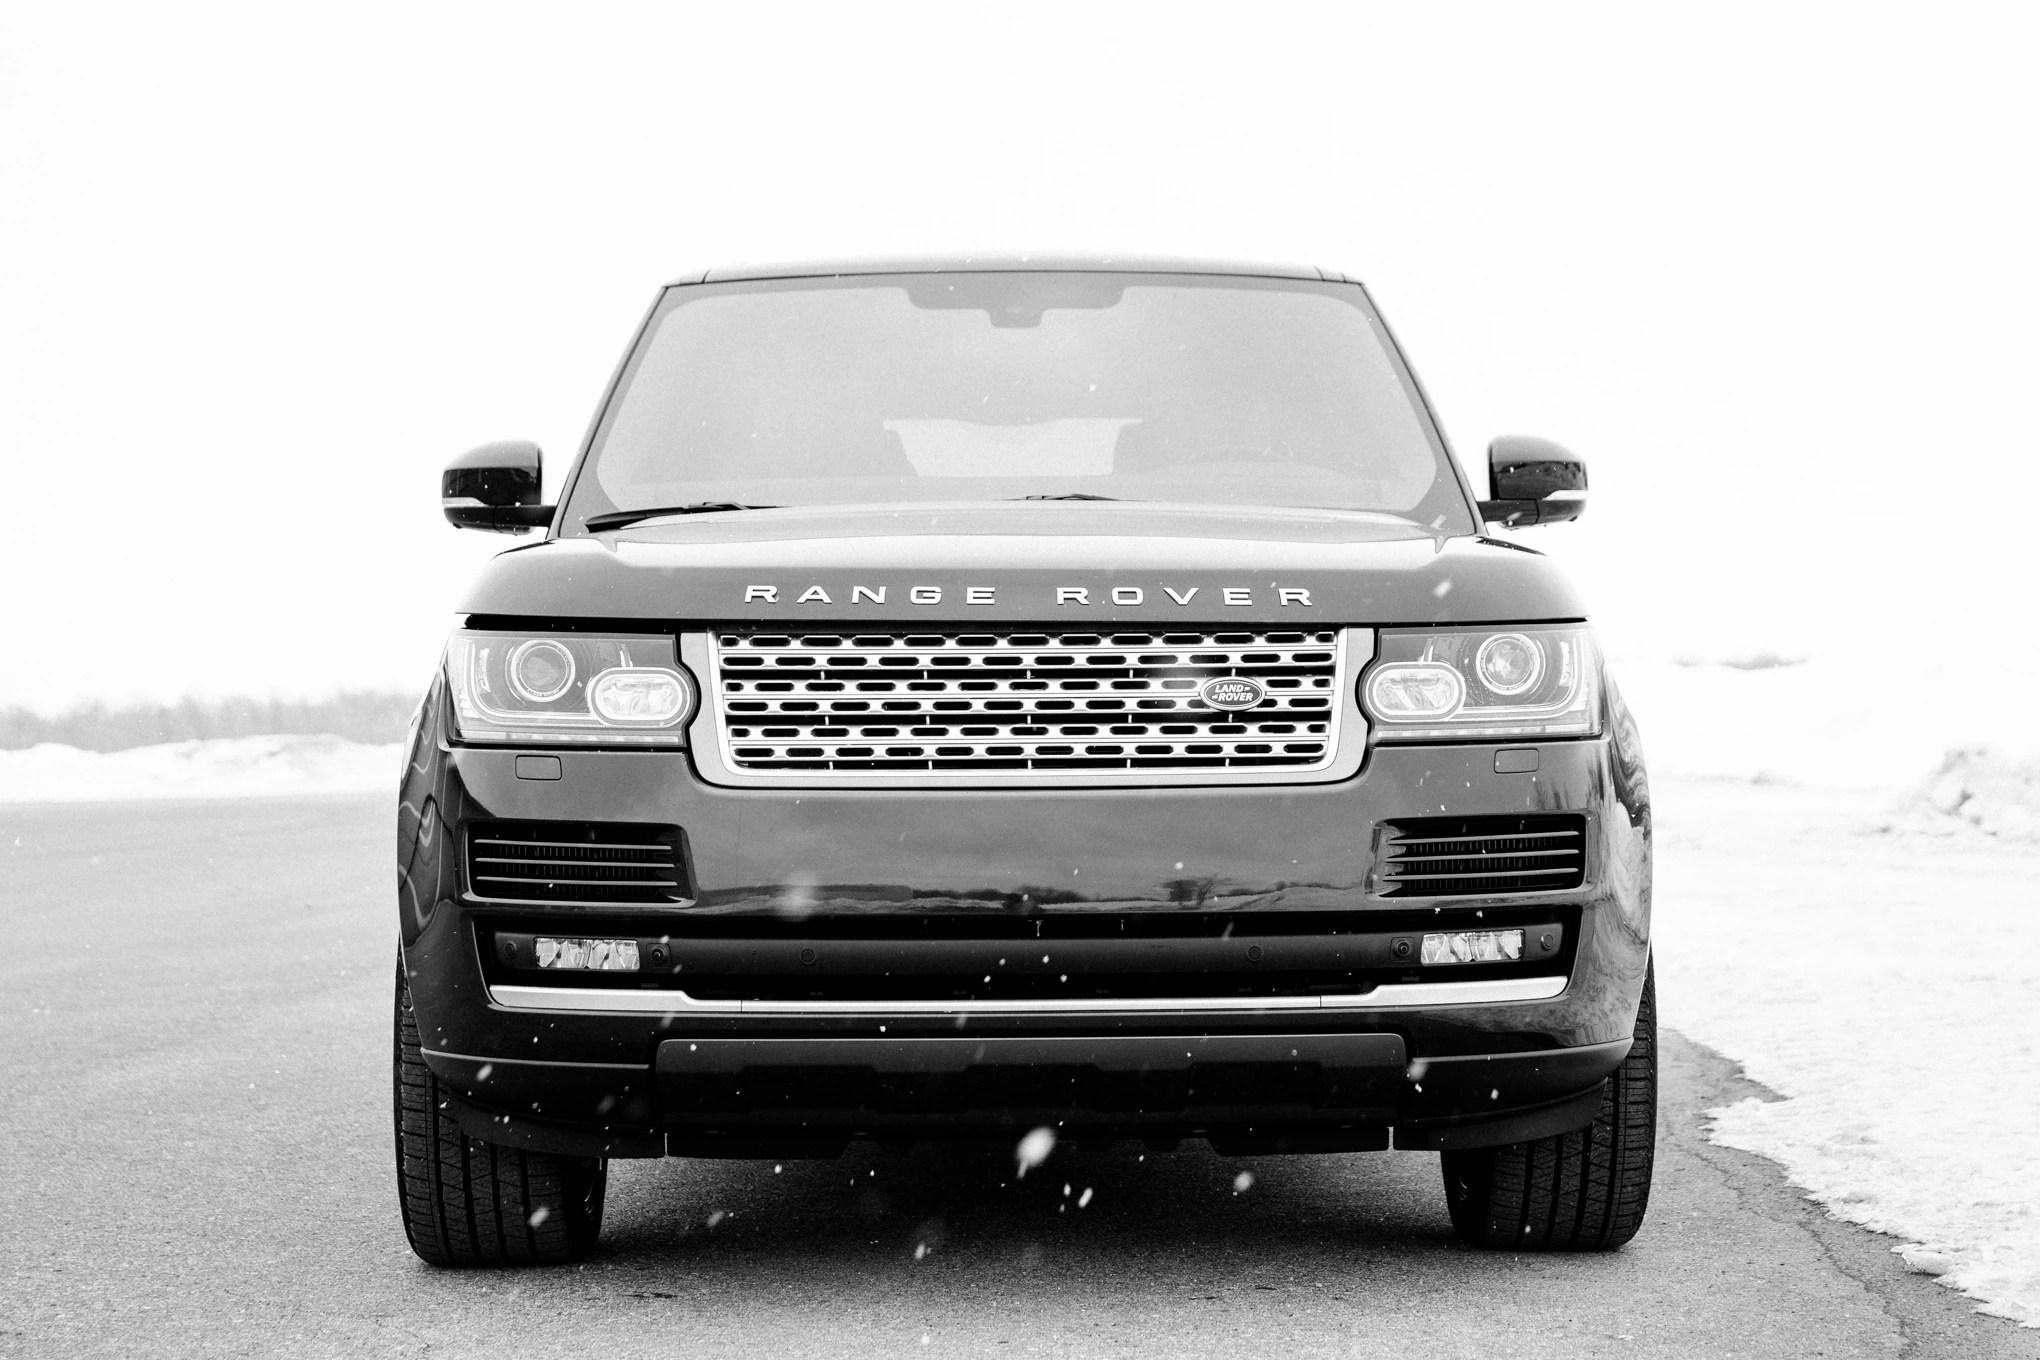 2014 Range Rover Autobiography Long Wheelbase Around The Block